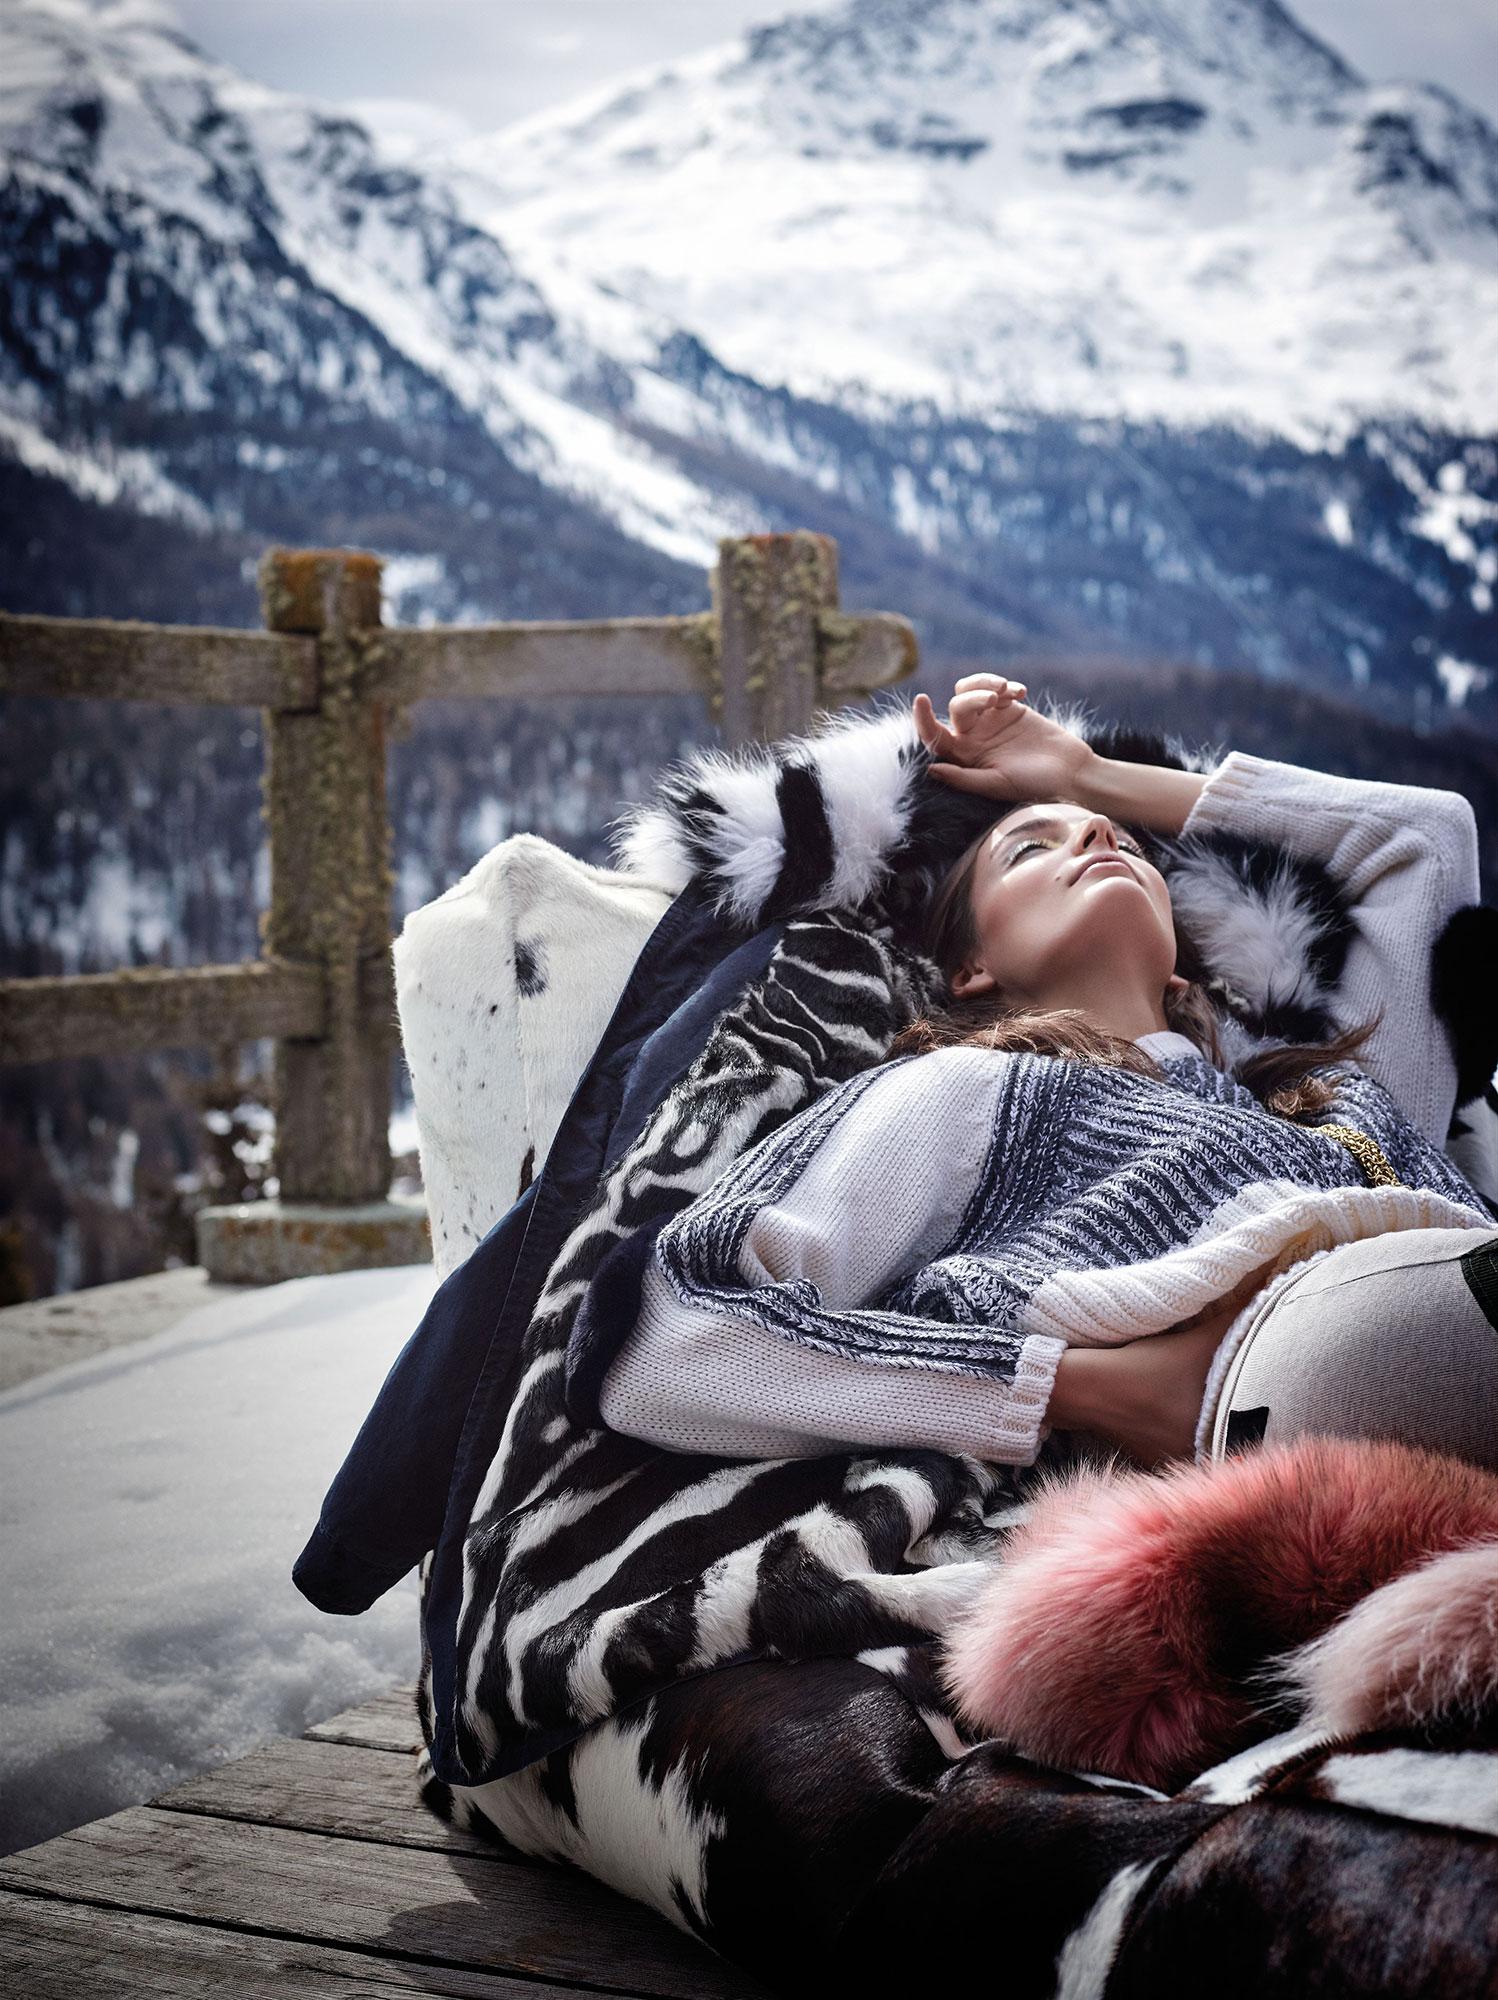 Mr & Mrs FW 2017/2018 – Look Book | Matteo Gastel | Mr & Mrs | Gioia | Raffaella Campeggi | Numerique Retouch Photo Retouching Studio